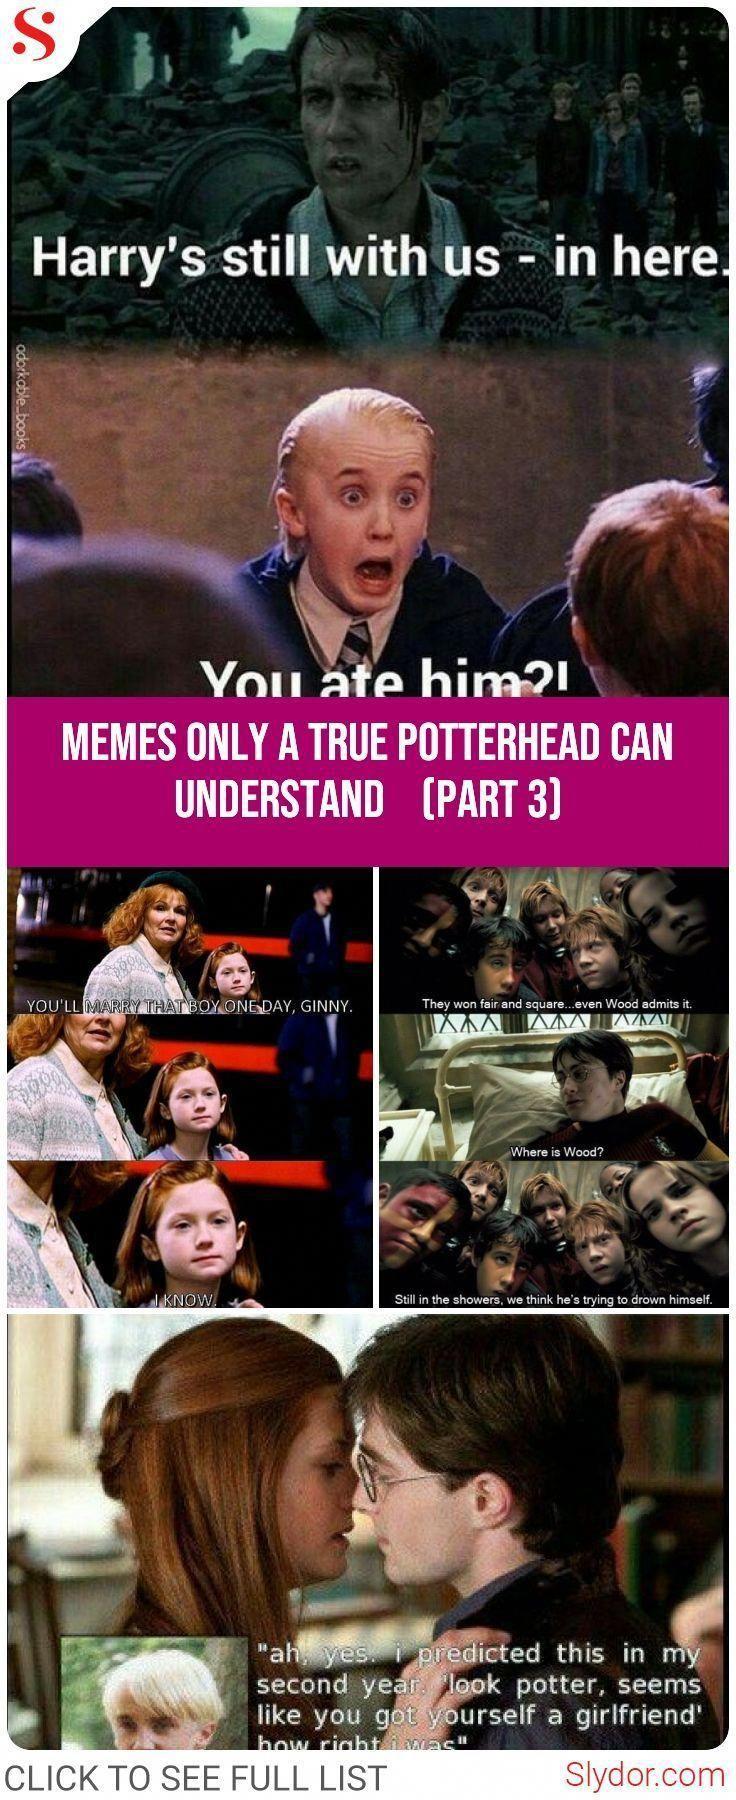 Harry Potter Memes Only A True Potterhead Can Understand Part 3 Harrypotter Memes Pot Harry Potter Memes Hilarious Harry Potter Jokes Harry Potter Memes